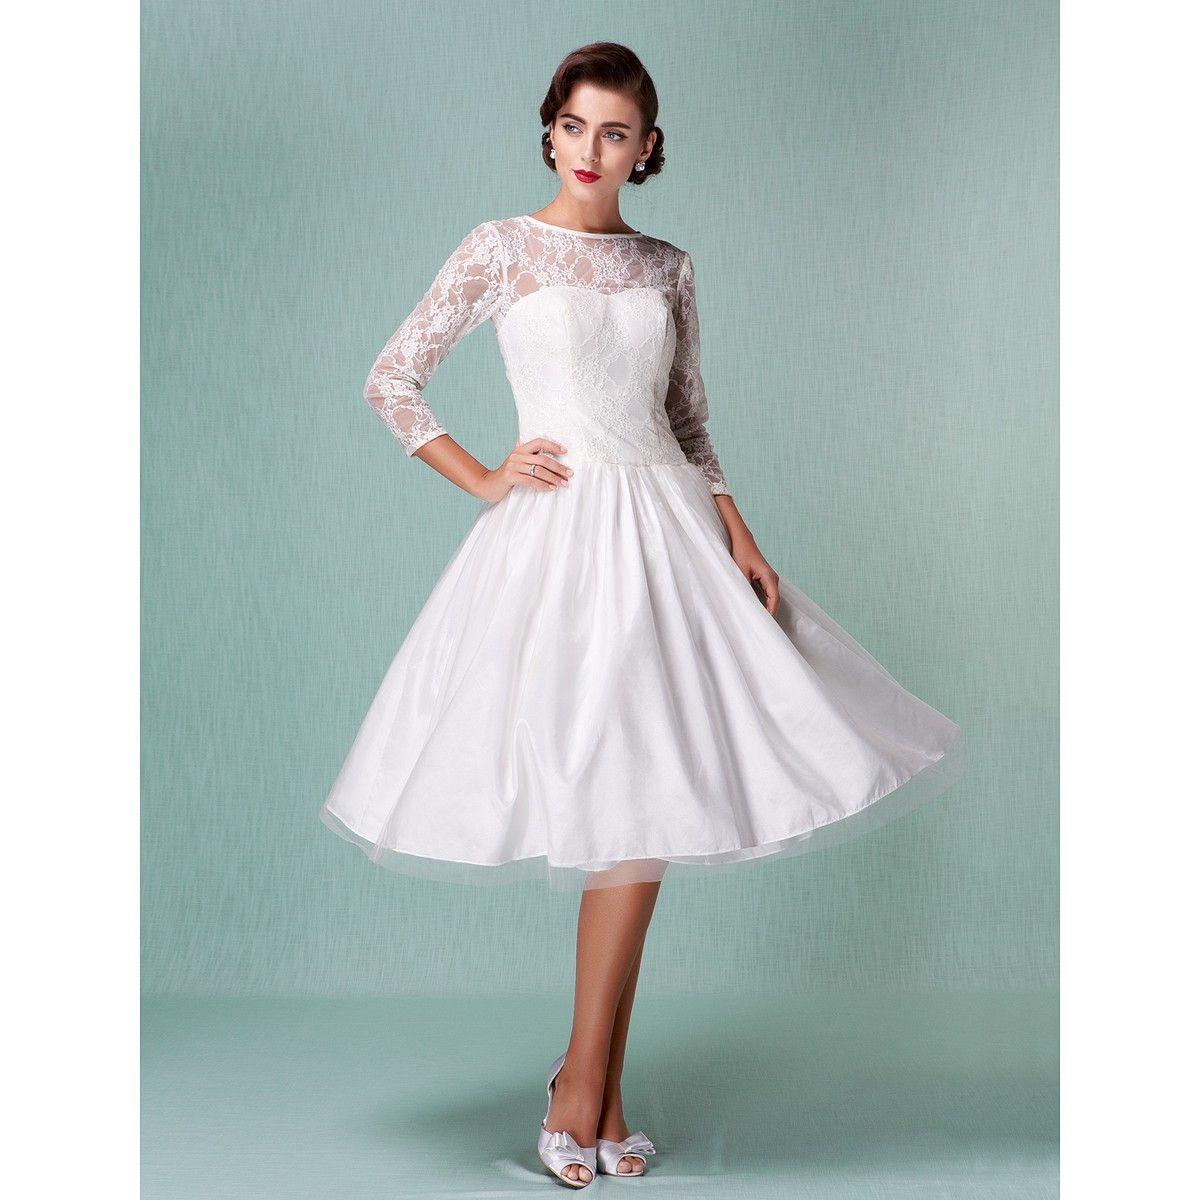 Dorable Audrey Hepburn Inspired Wedding Dress Ensign - All Wedding ...